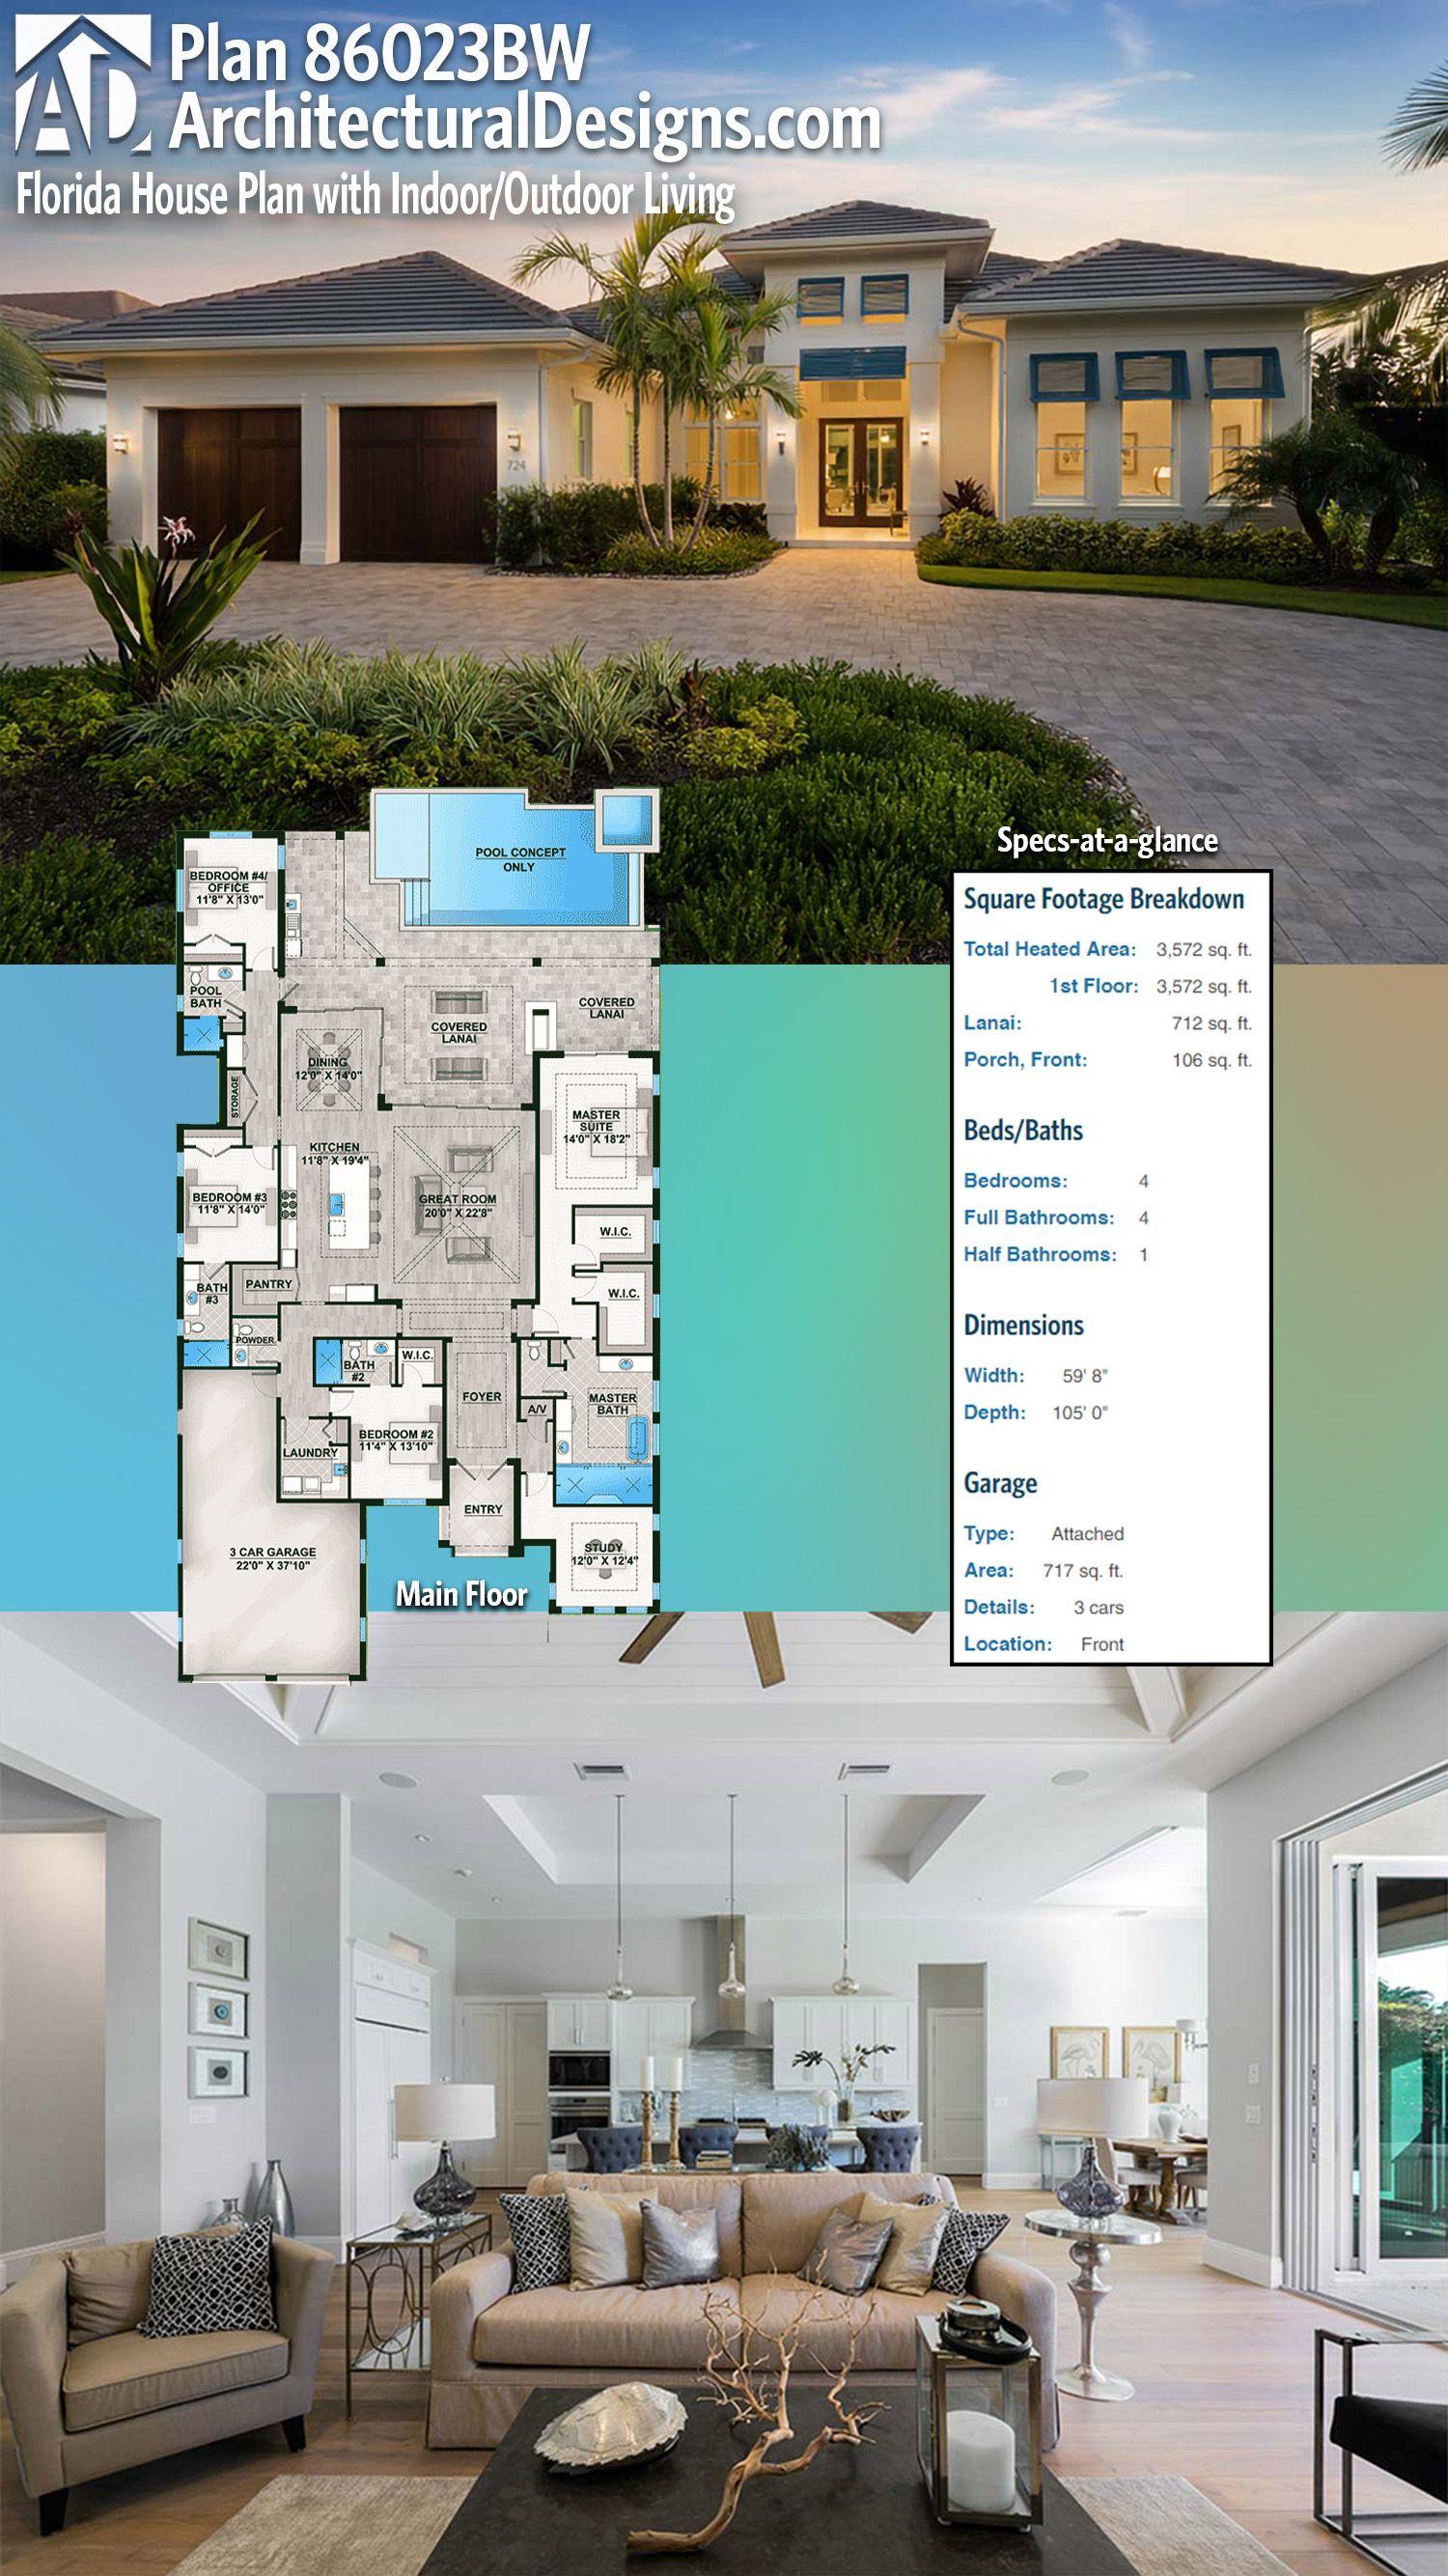 Architecture Architectural Designs Contemporary Plan